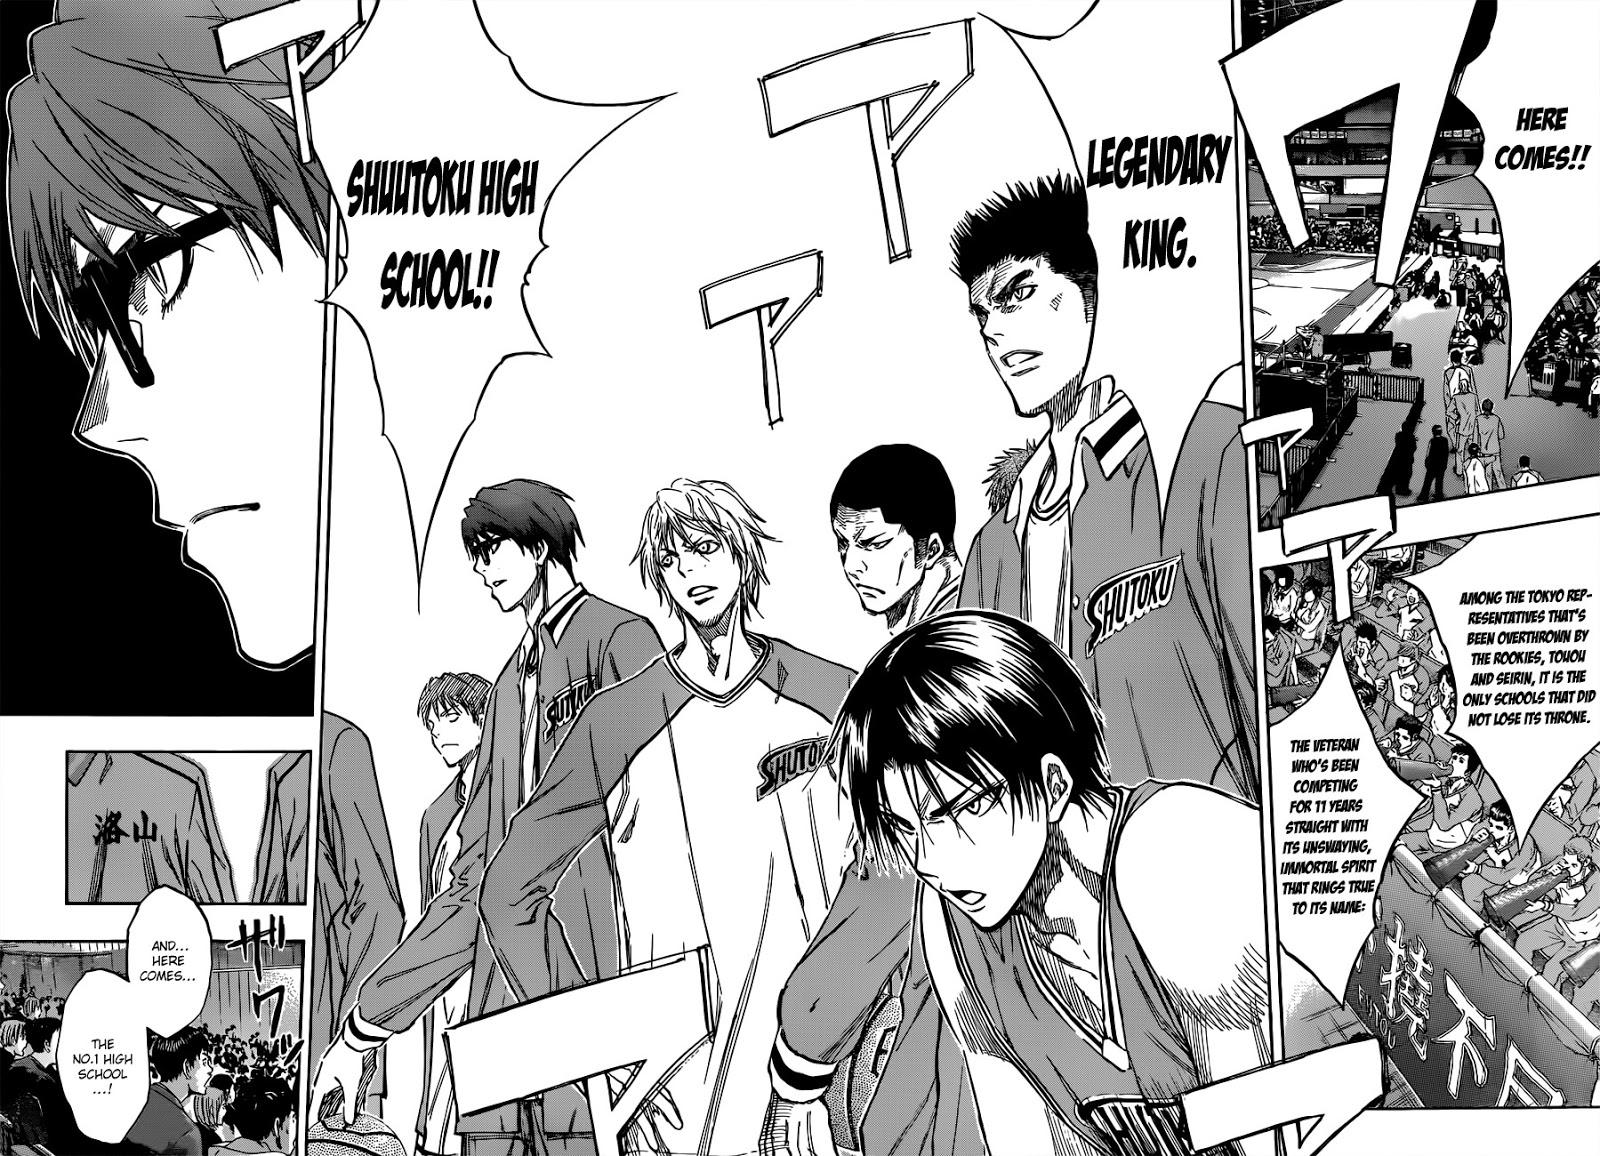 Kuroko no Basket Manga Chapter 175 - Image 04-05